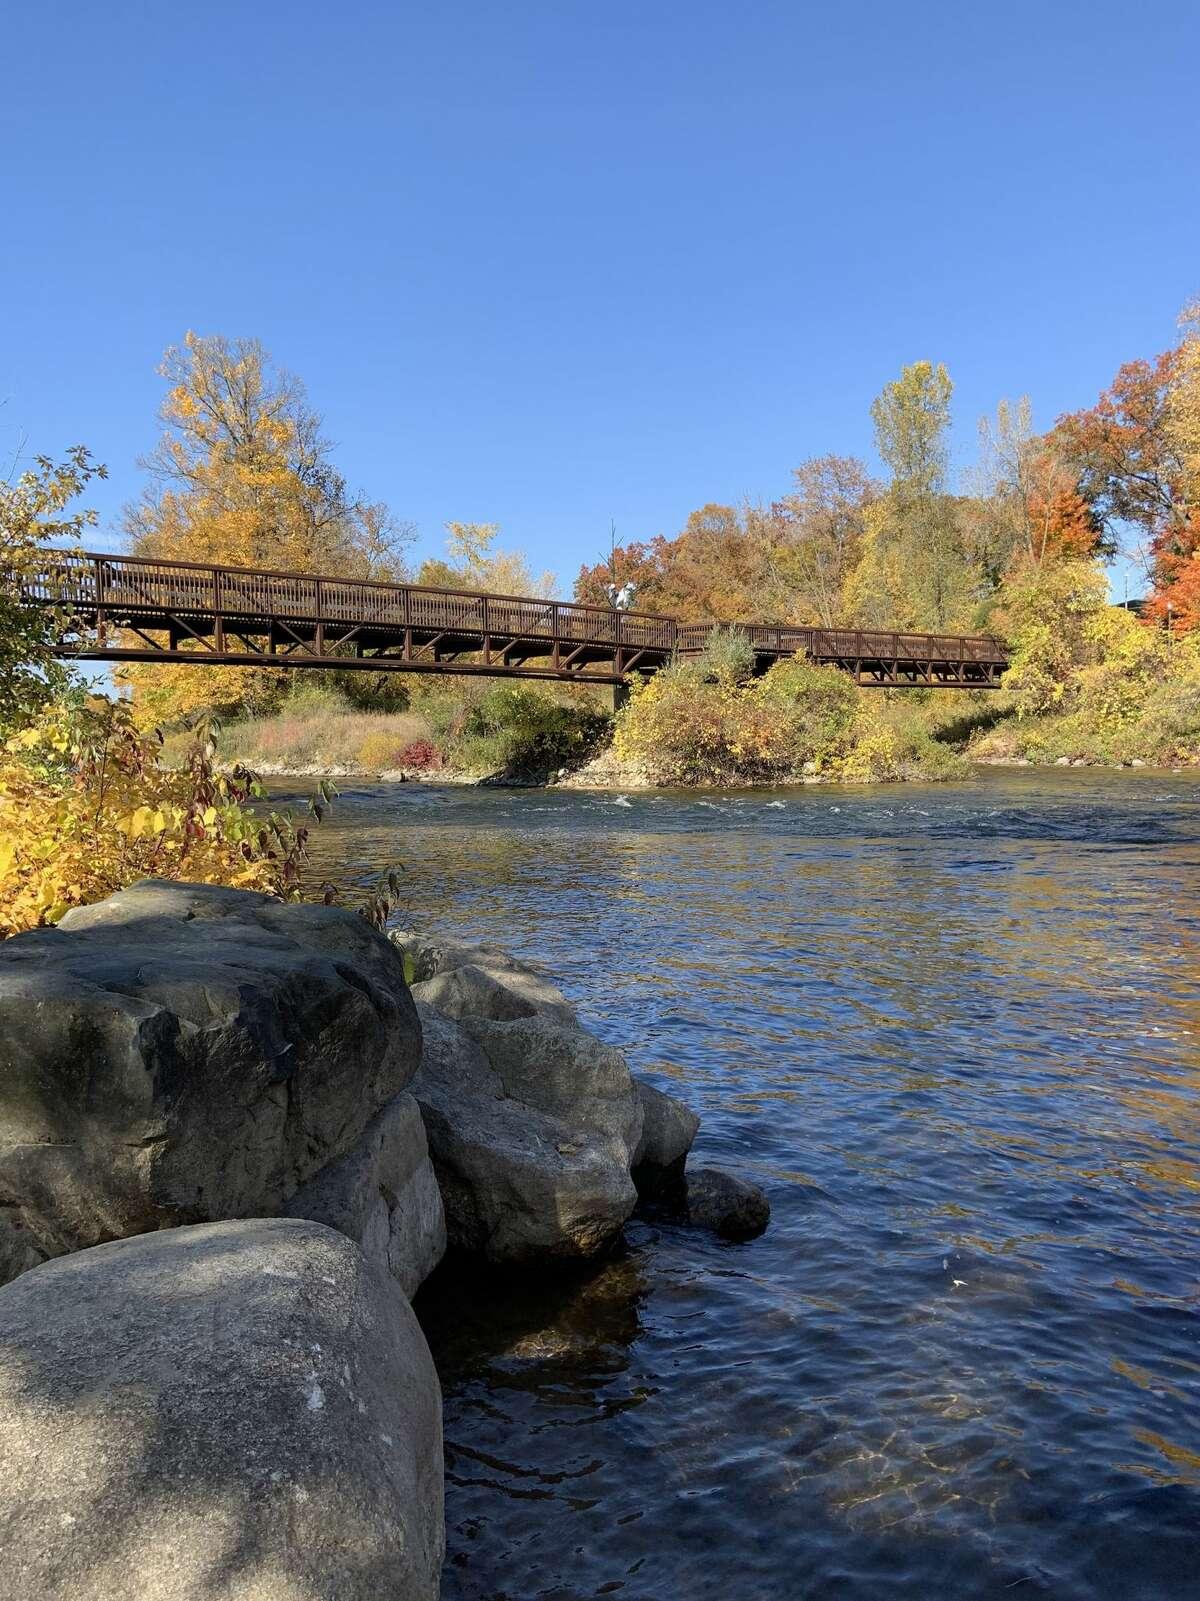 Rocks line the shore of the Muskegon River near the Riverwalk in Big Rapids. (Pioneer photo/Julie Norwood)